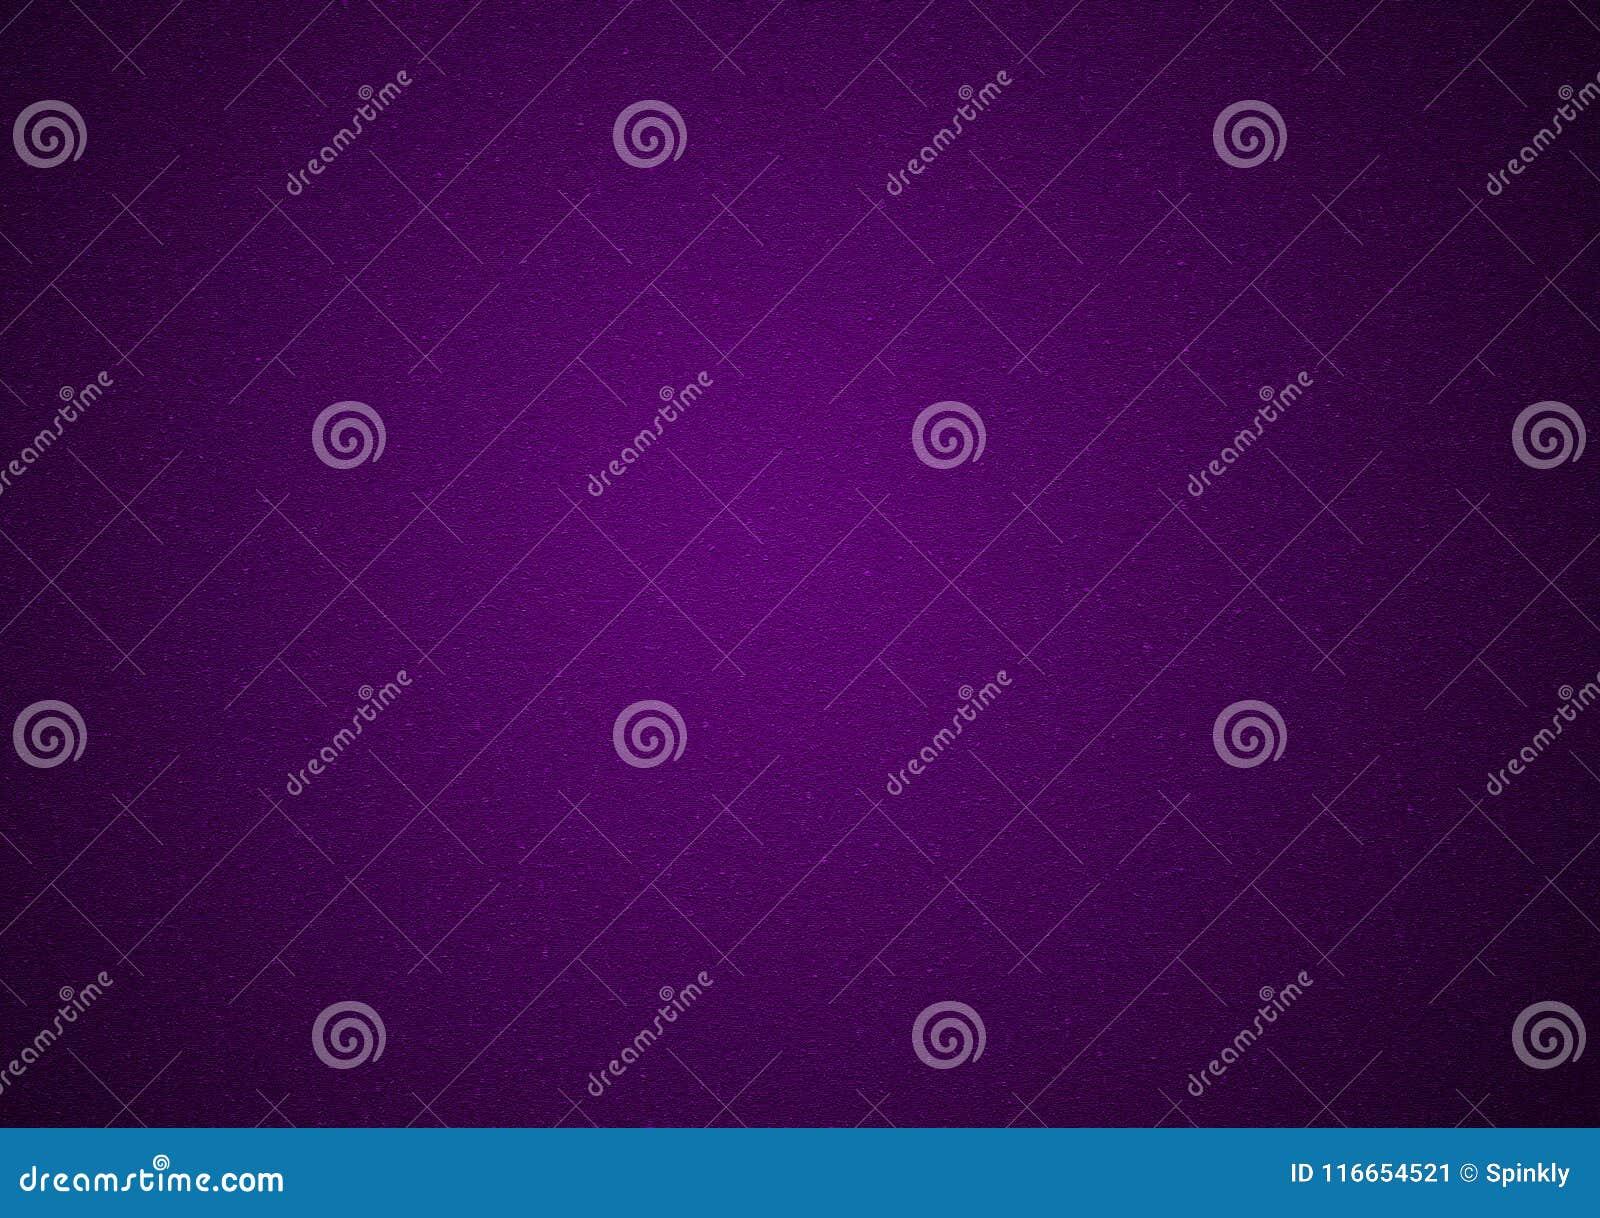 Purple plain background for wallpaper use